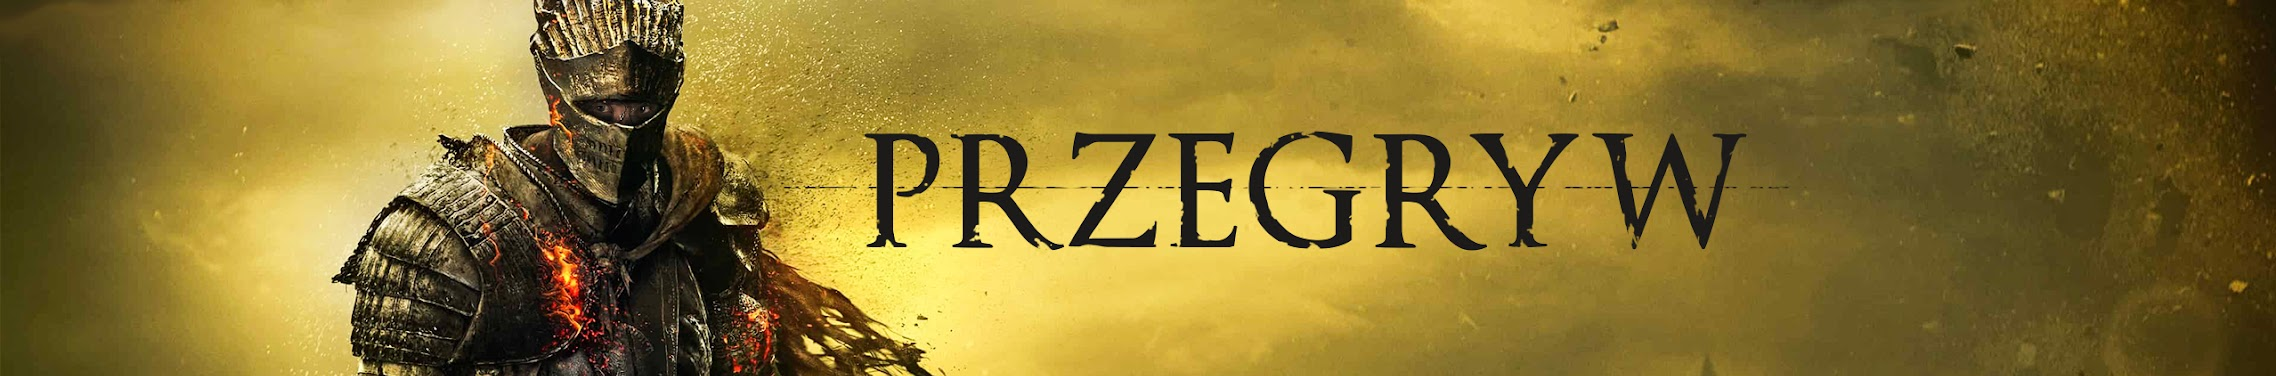 PrzeGryw